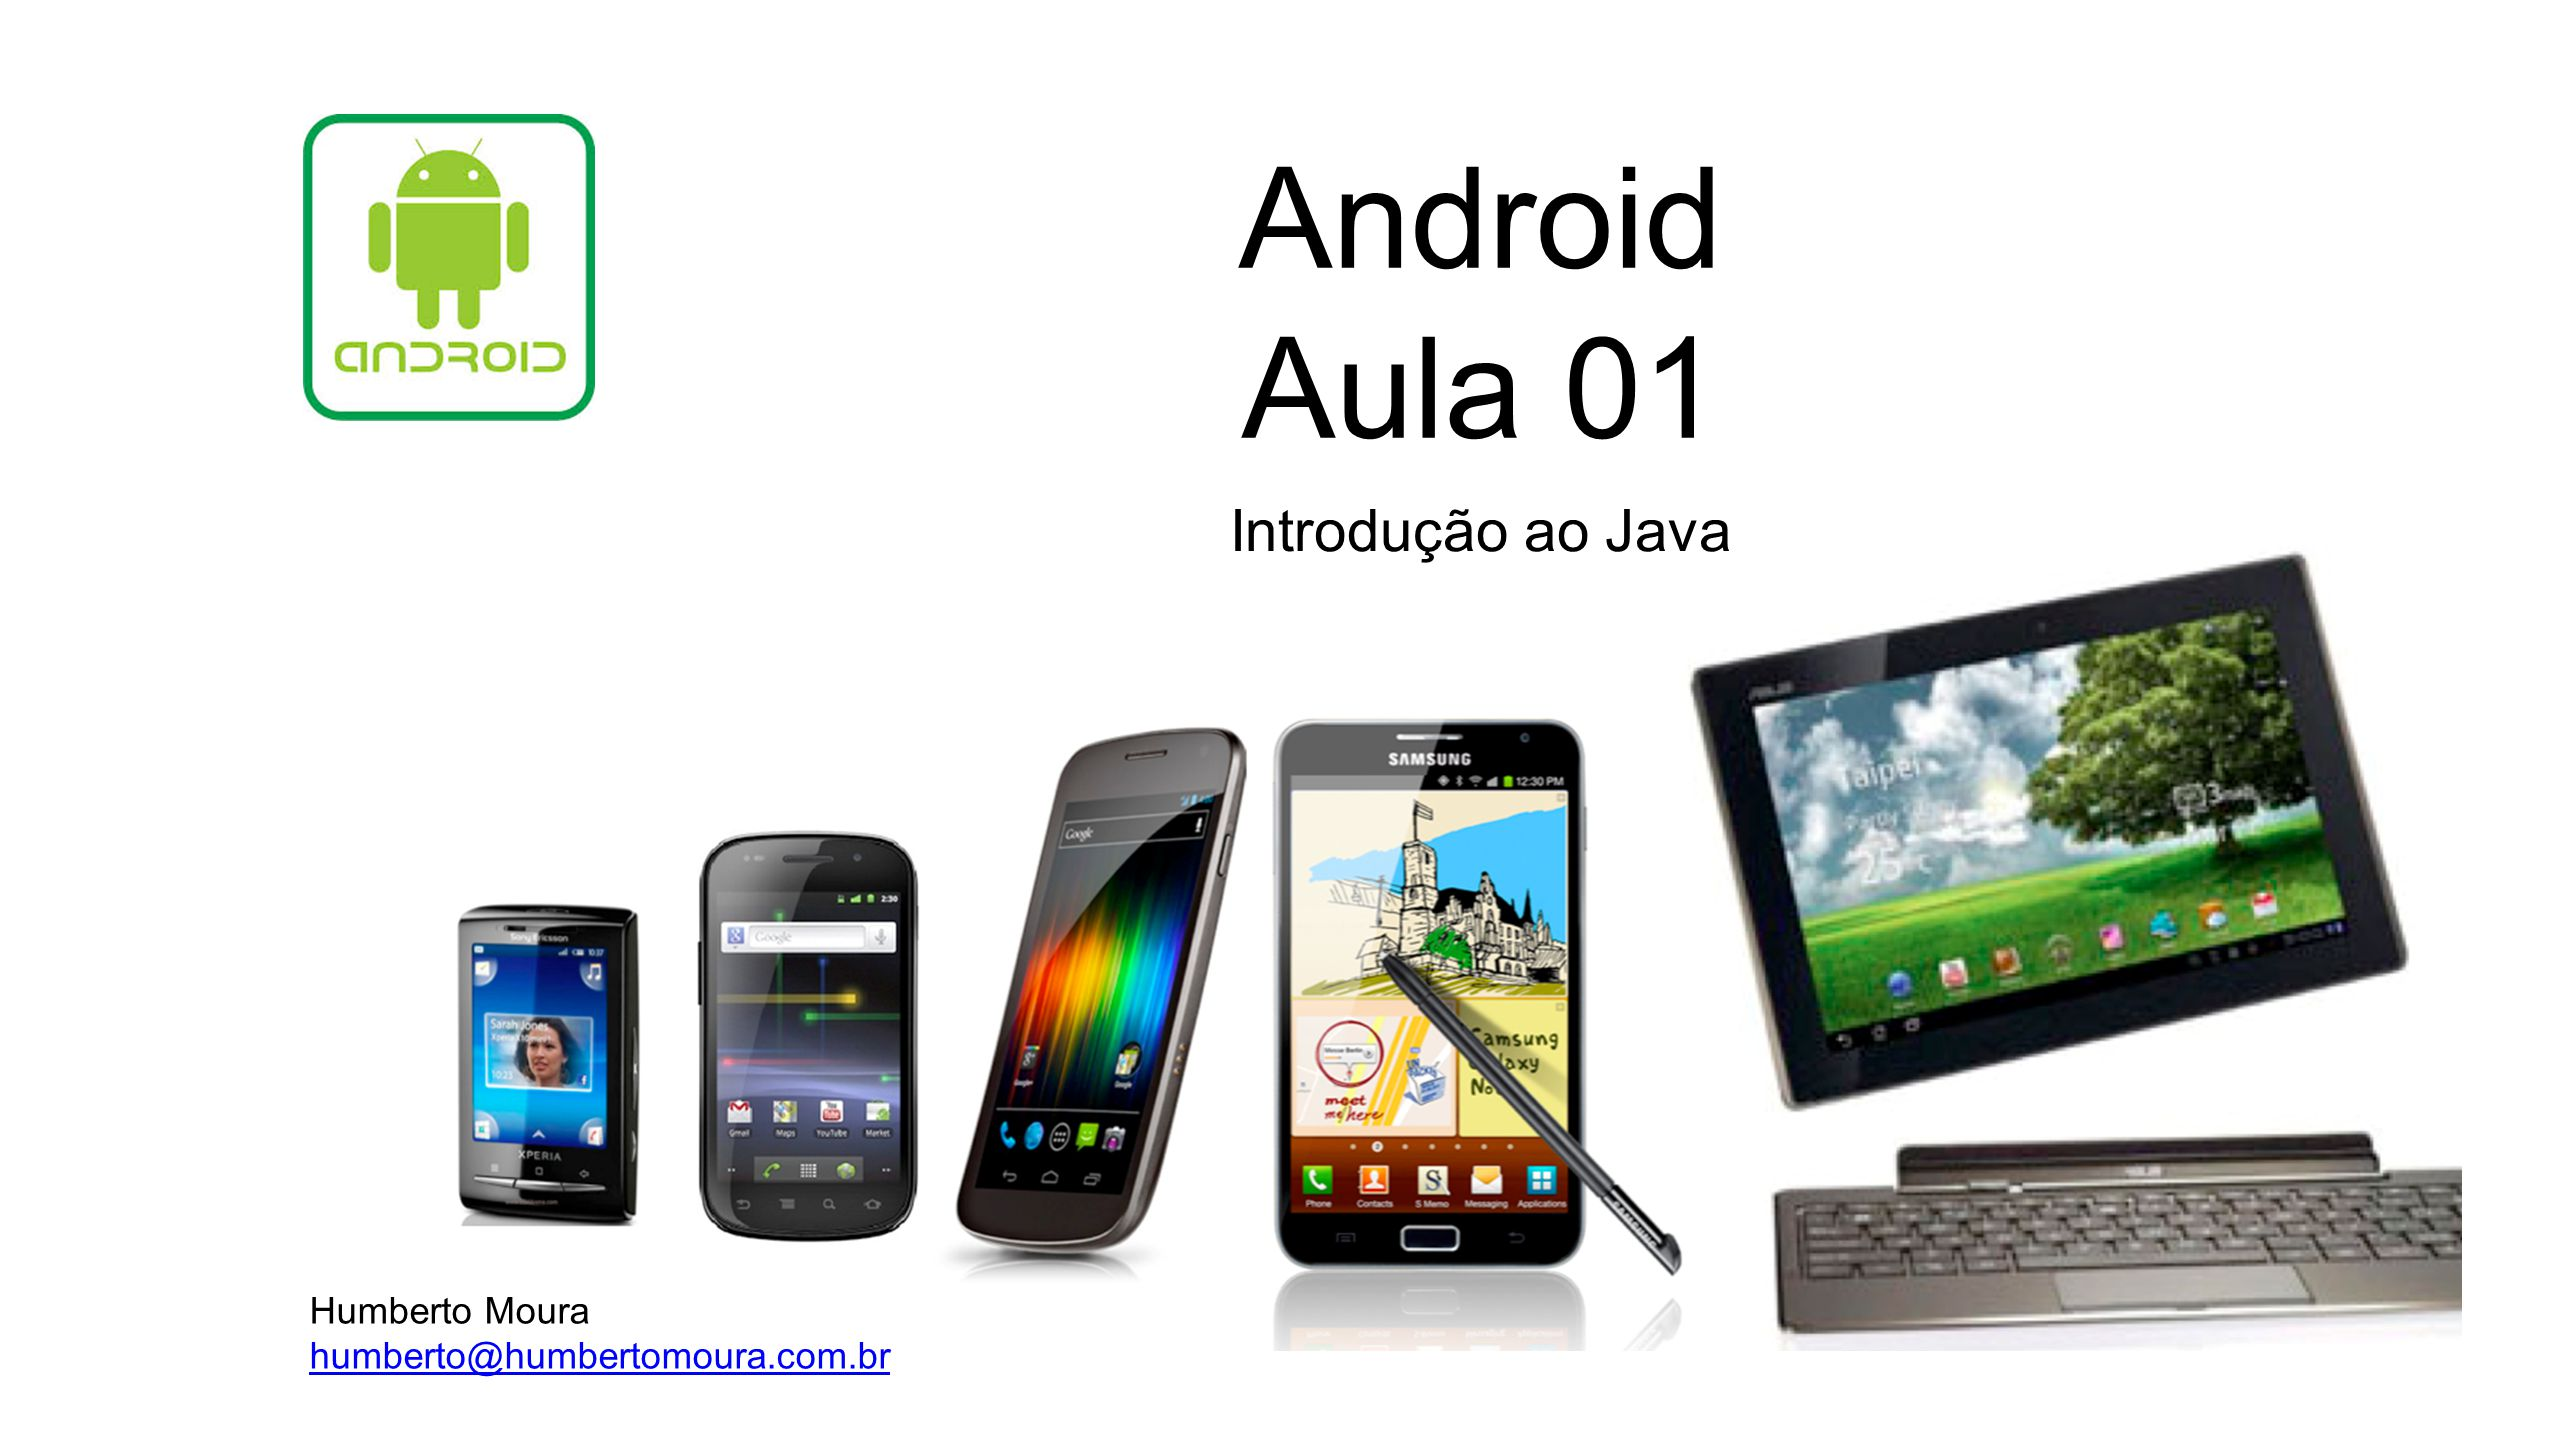 Android Aula 01 Introdução ao Java Humberto Moura